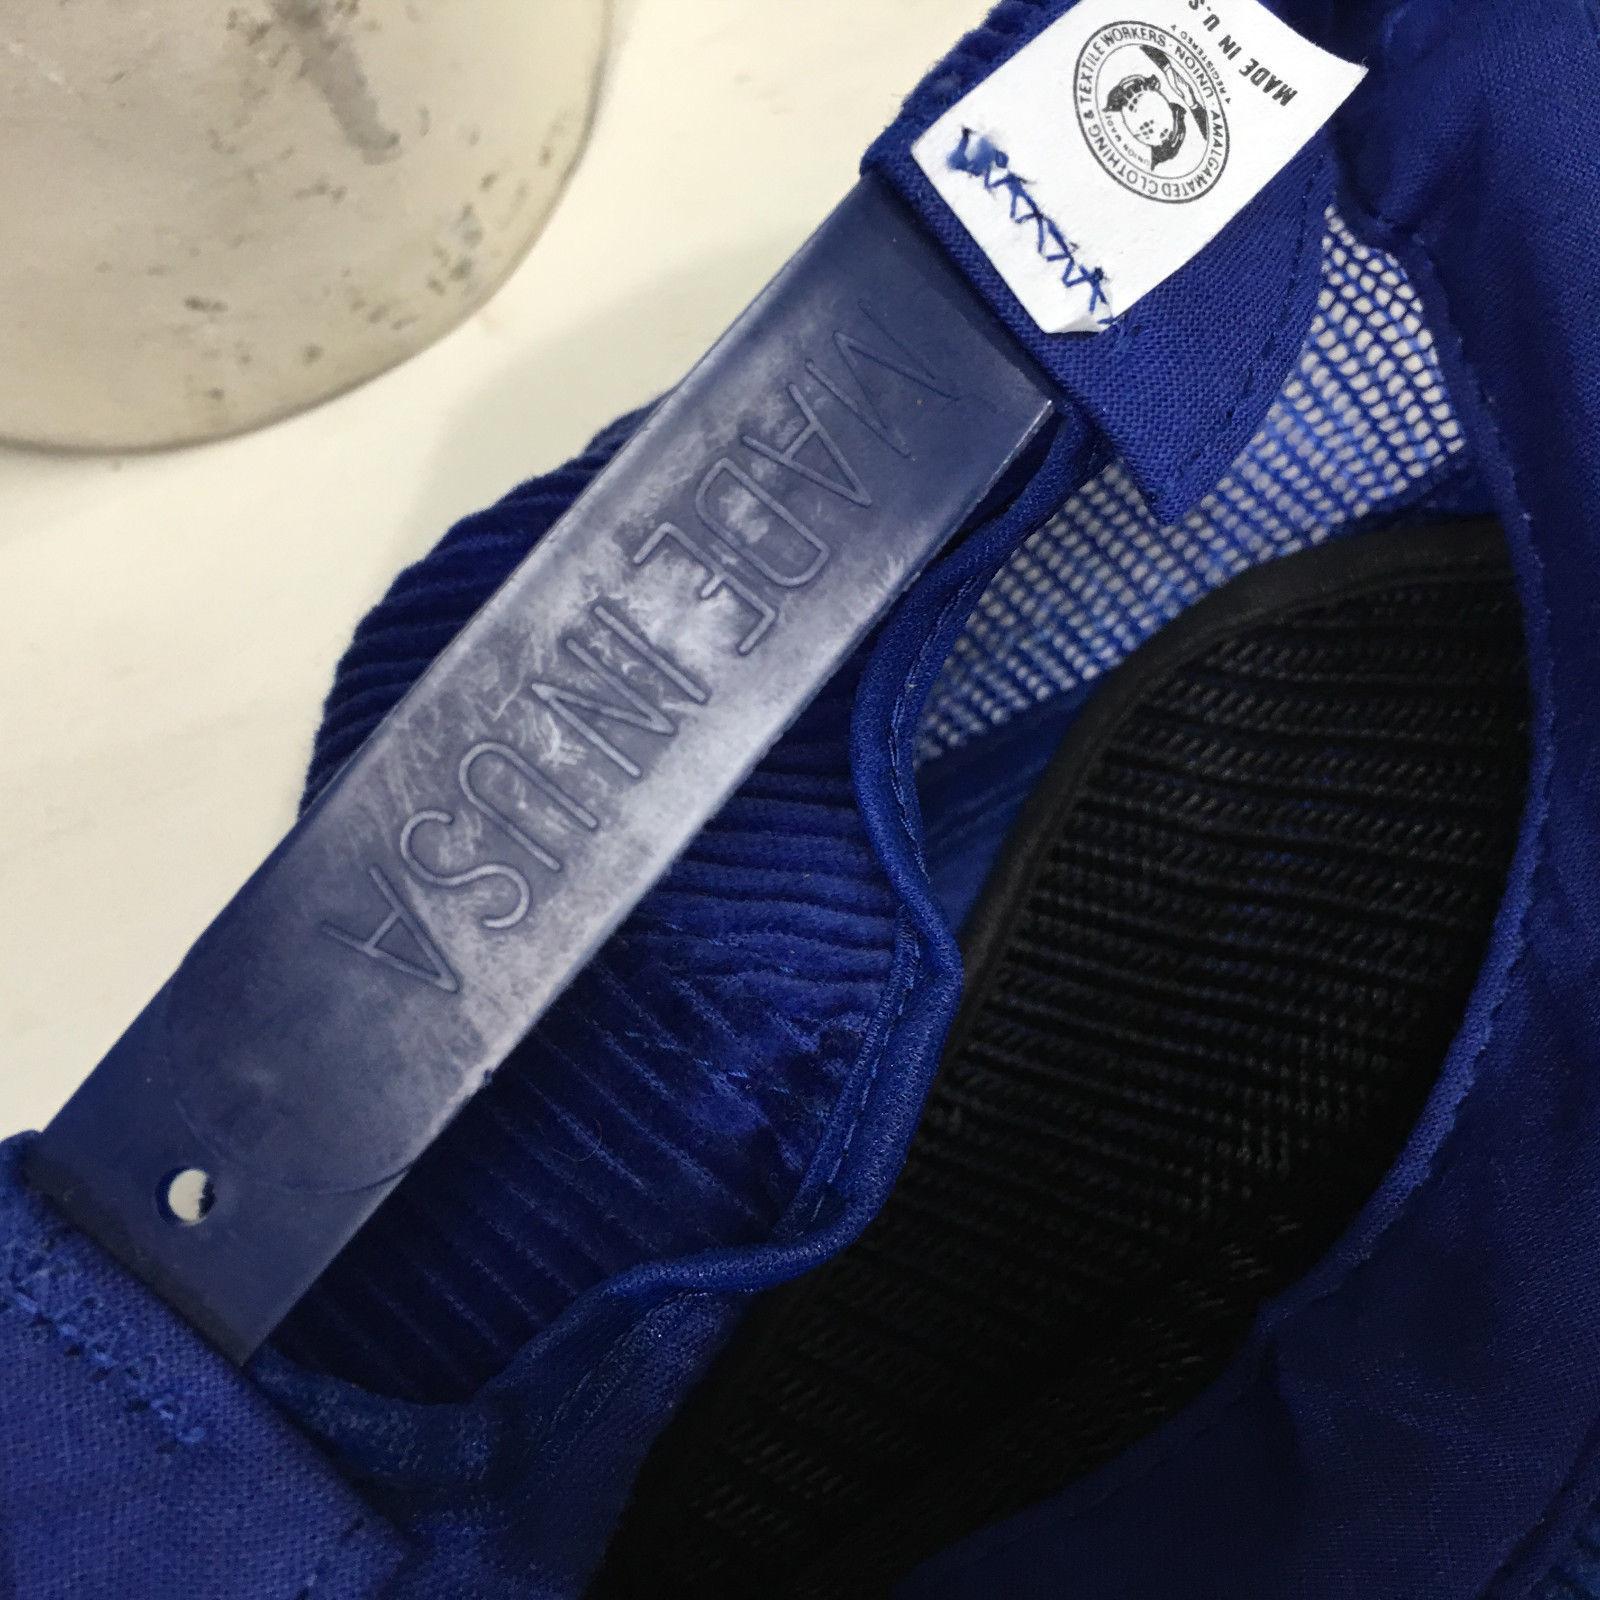 VTG Westinghouse Mod Serv Corduroy Snapback Made in USA Baseball Cap Hat image 5